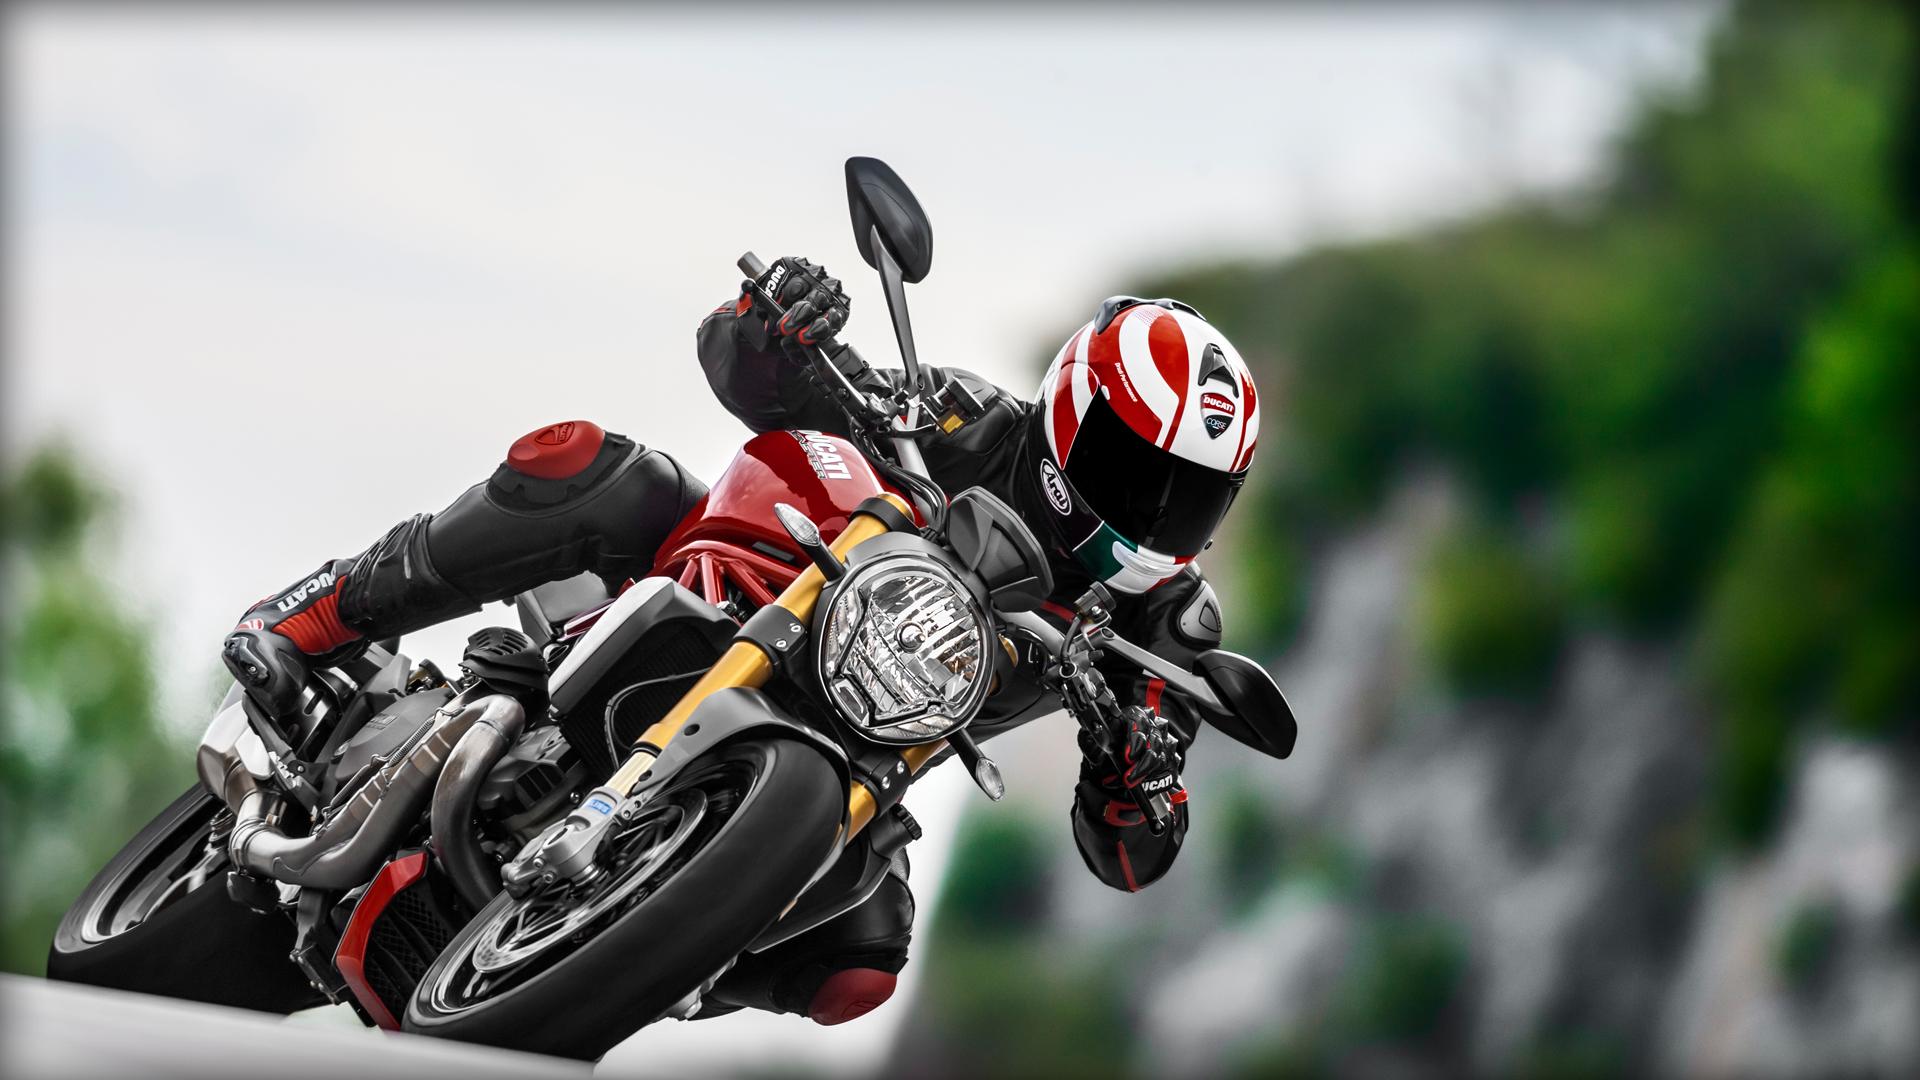 2014 Ducati    Ducati Monster 1200 S